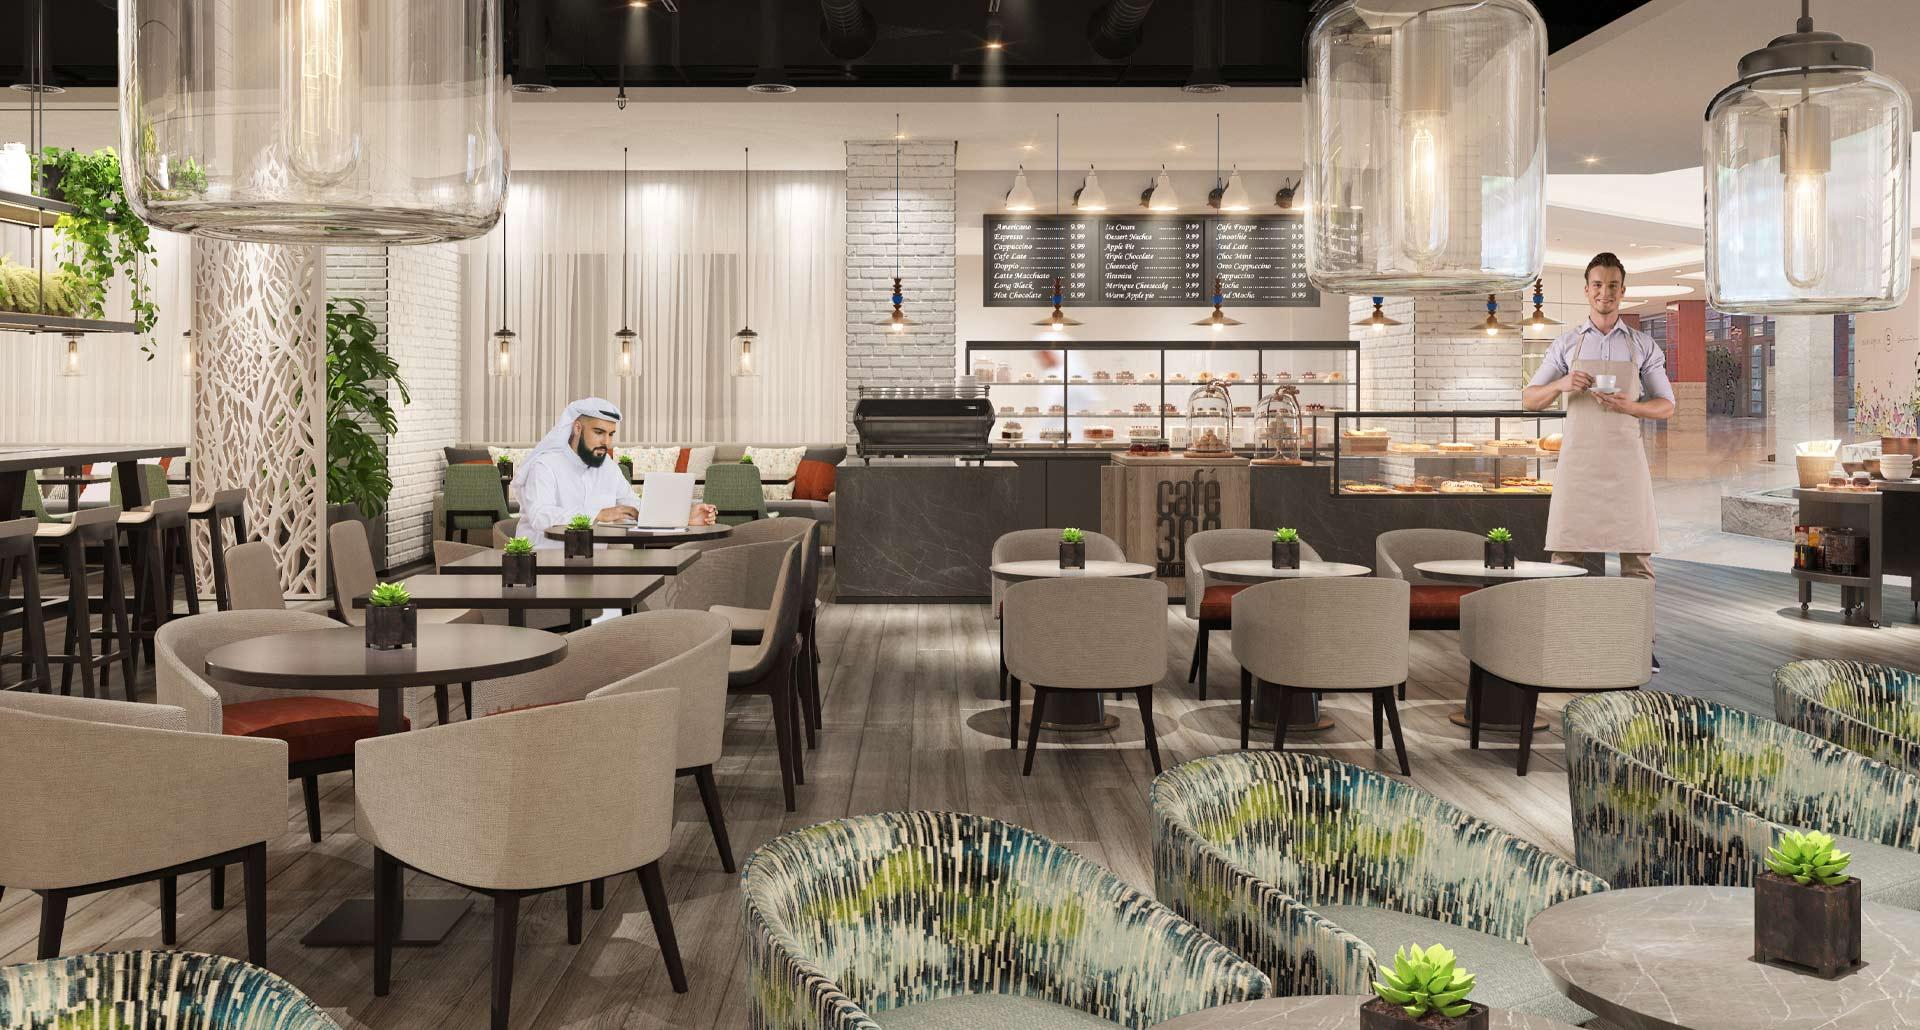 Cafe 302 Interiors 2